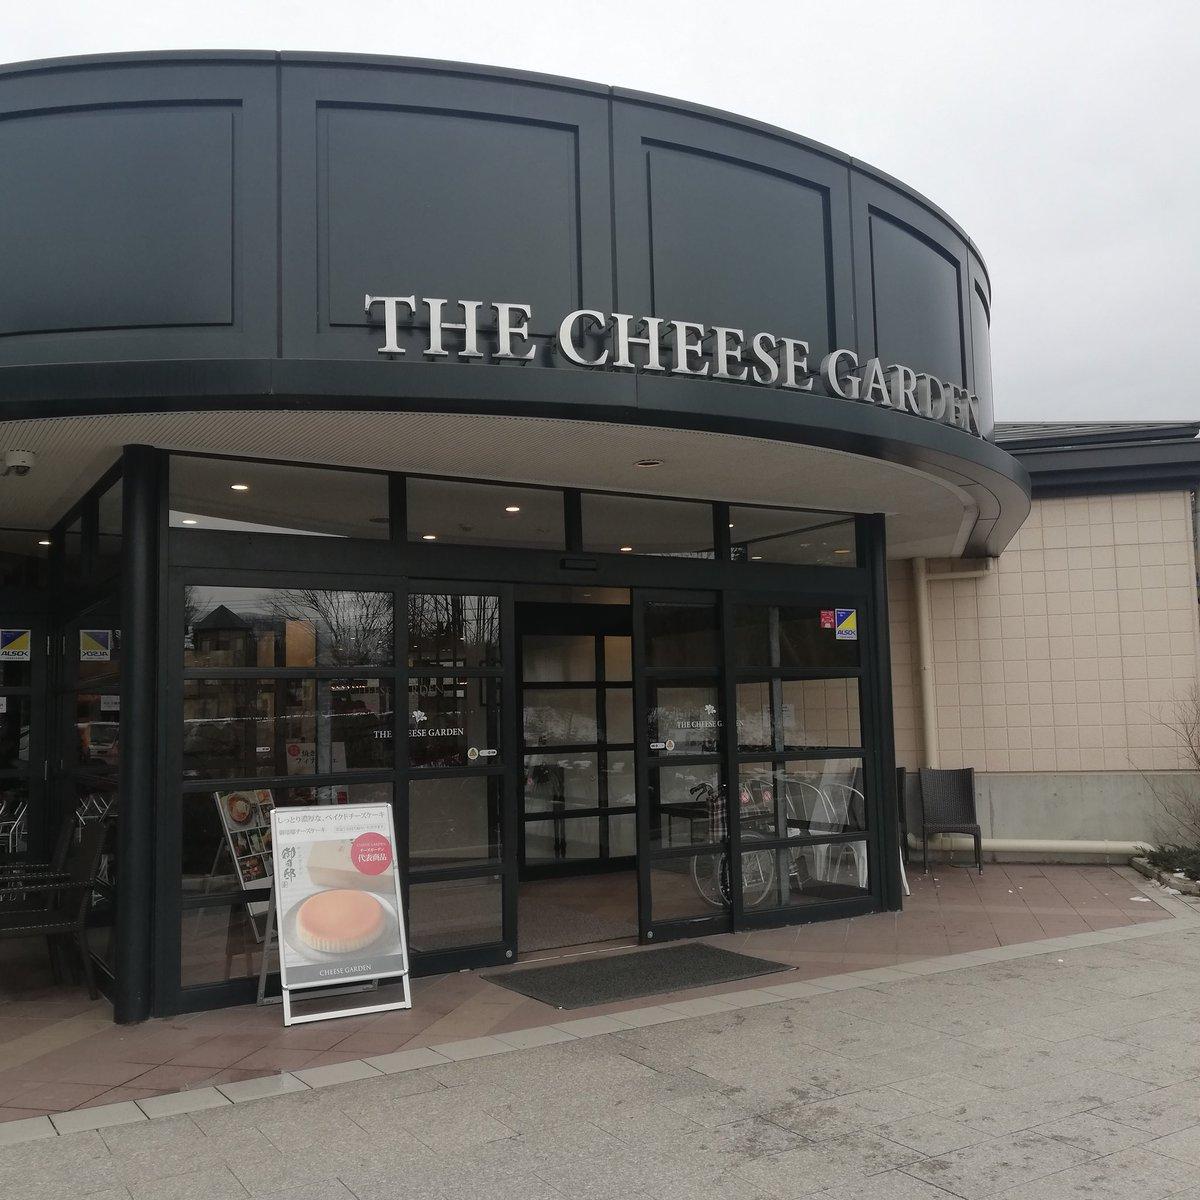 test ツイッターメディア - 御用邸チーズケーキ買った 試食の時点で激うま😋 https://t.co/JjXQfEvHi4